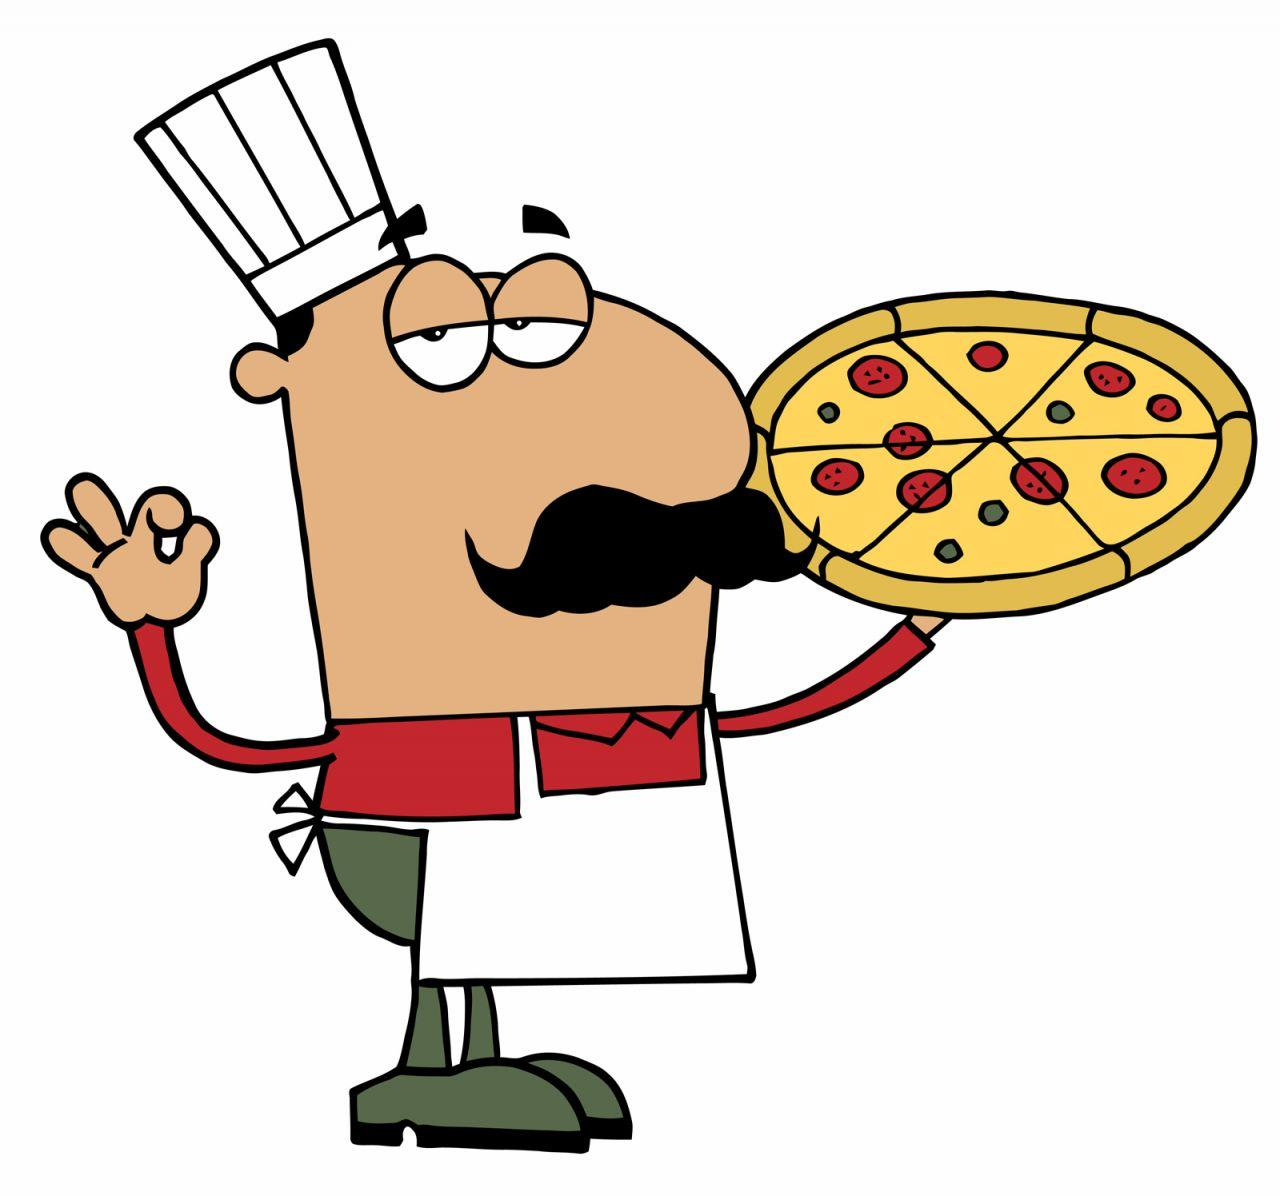 1280x1196 Pizza Man Clip Art Free Vector Art, Images, Graphics Amp Clipart